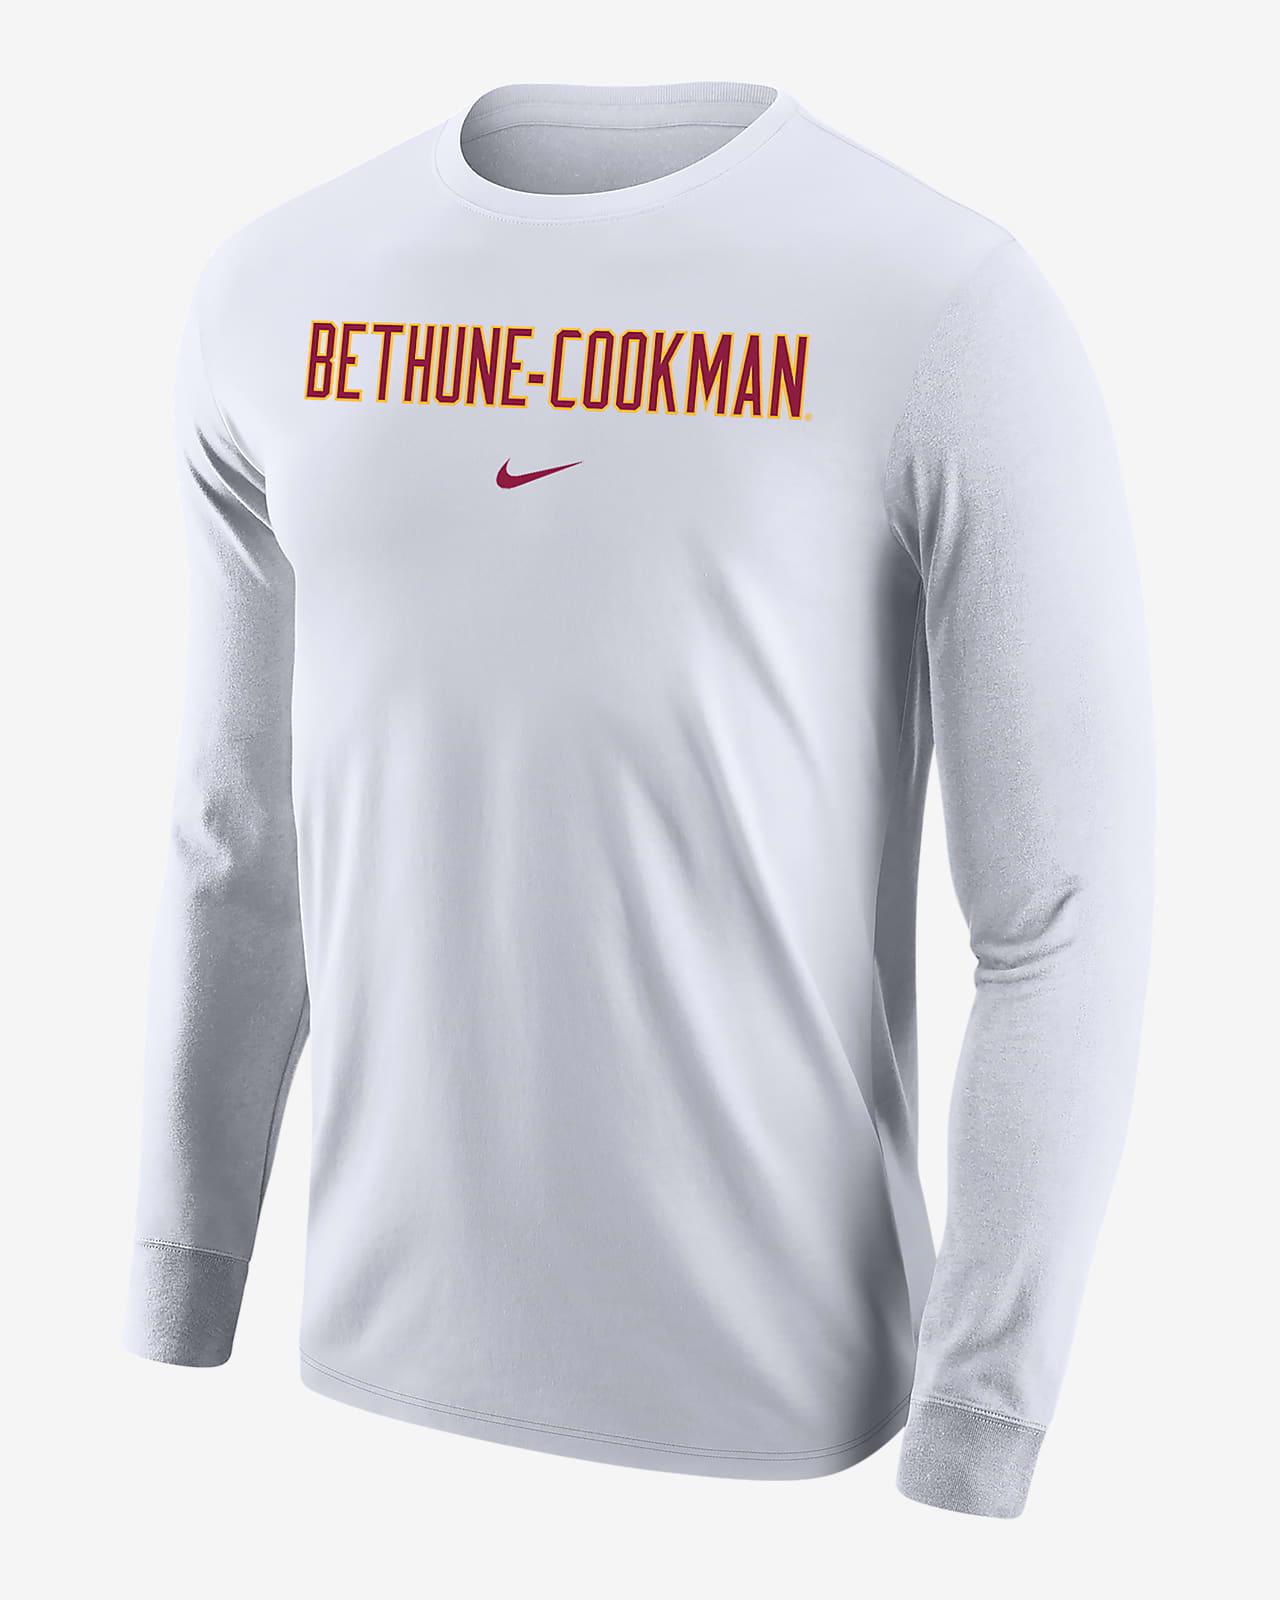 Nike College (Bethune-Cookman) Men's Long-Sleeve T-Shirt